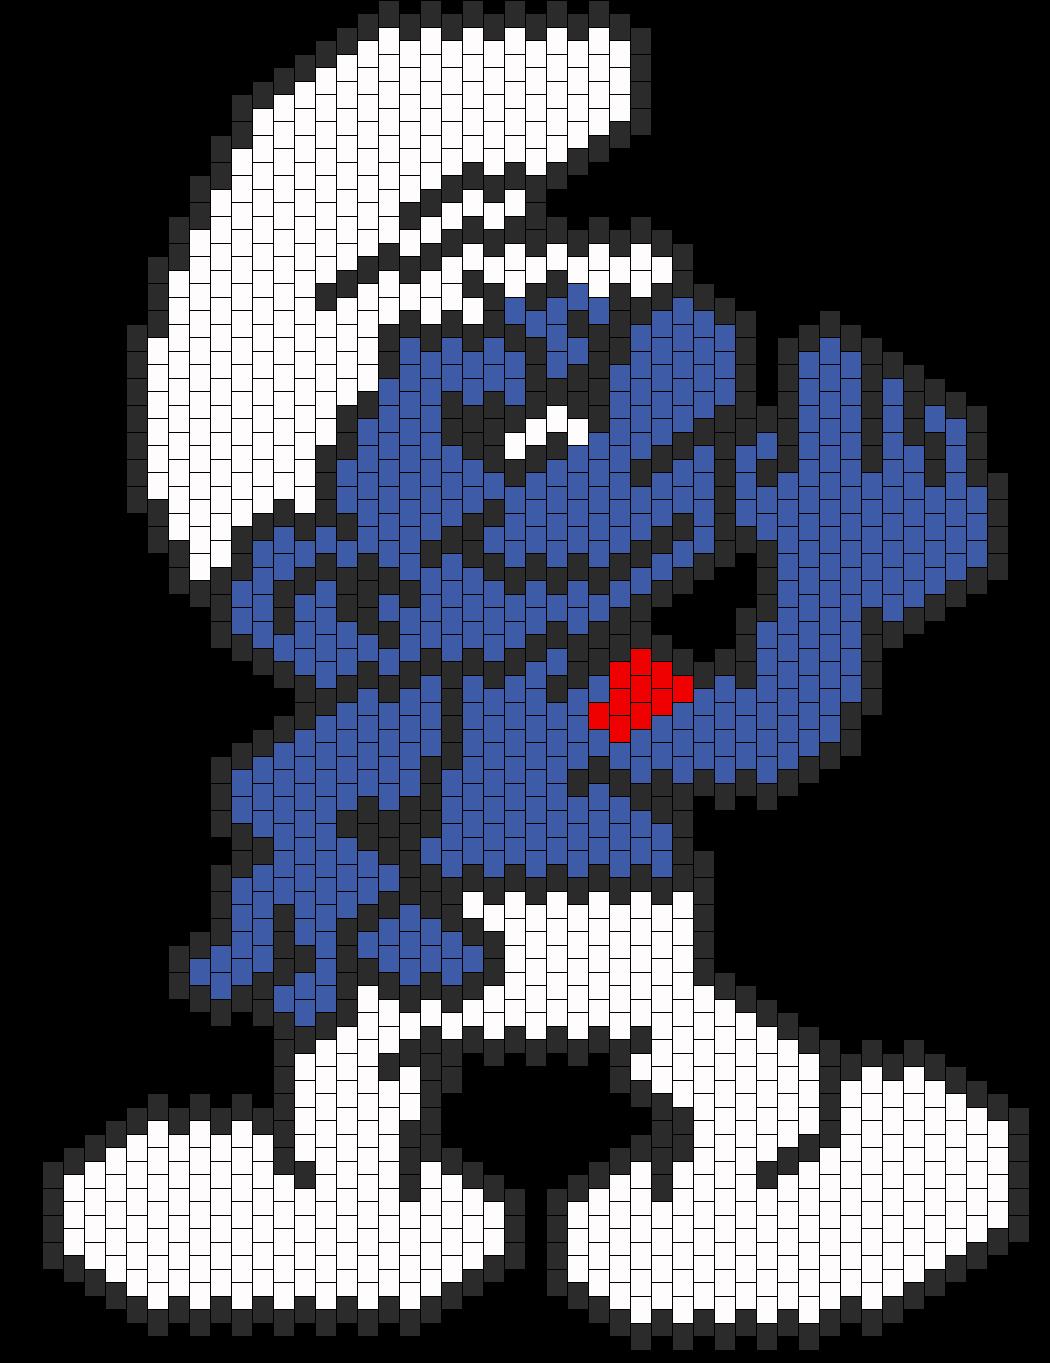 Hefty Smurf